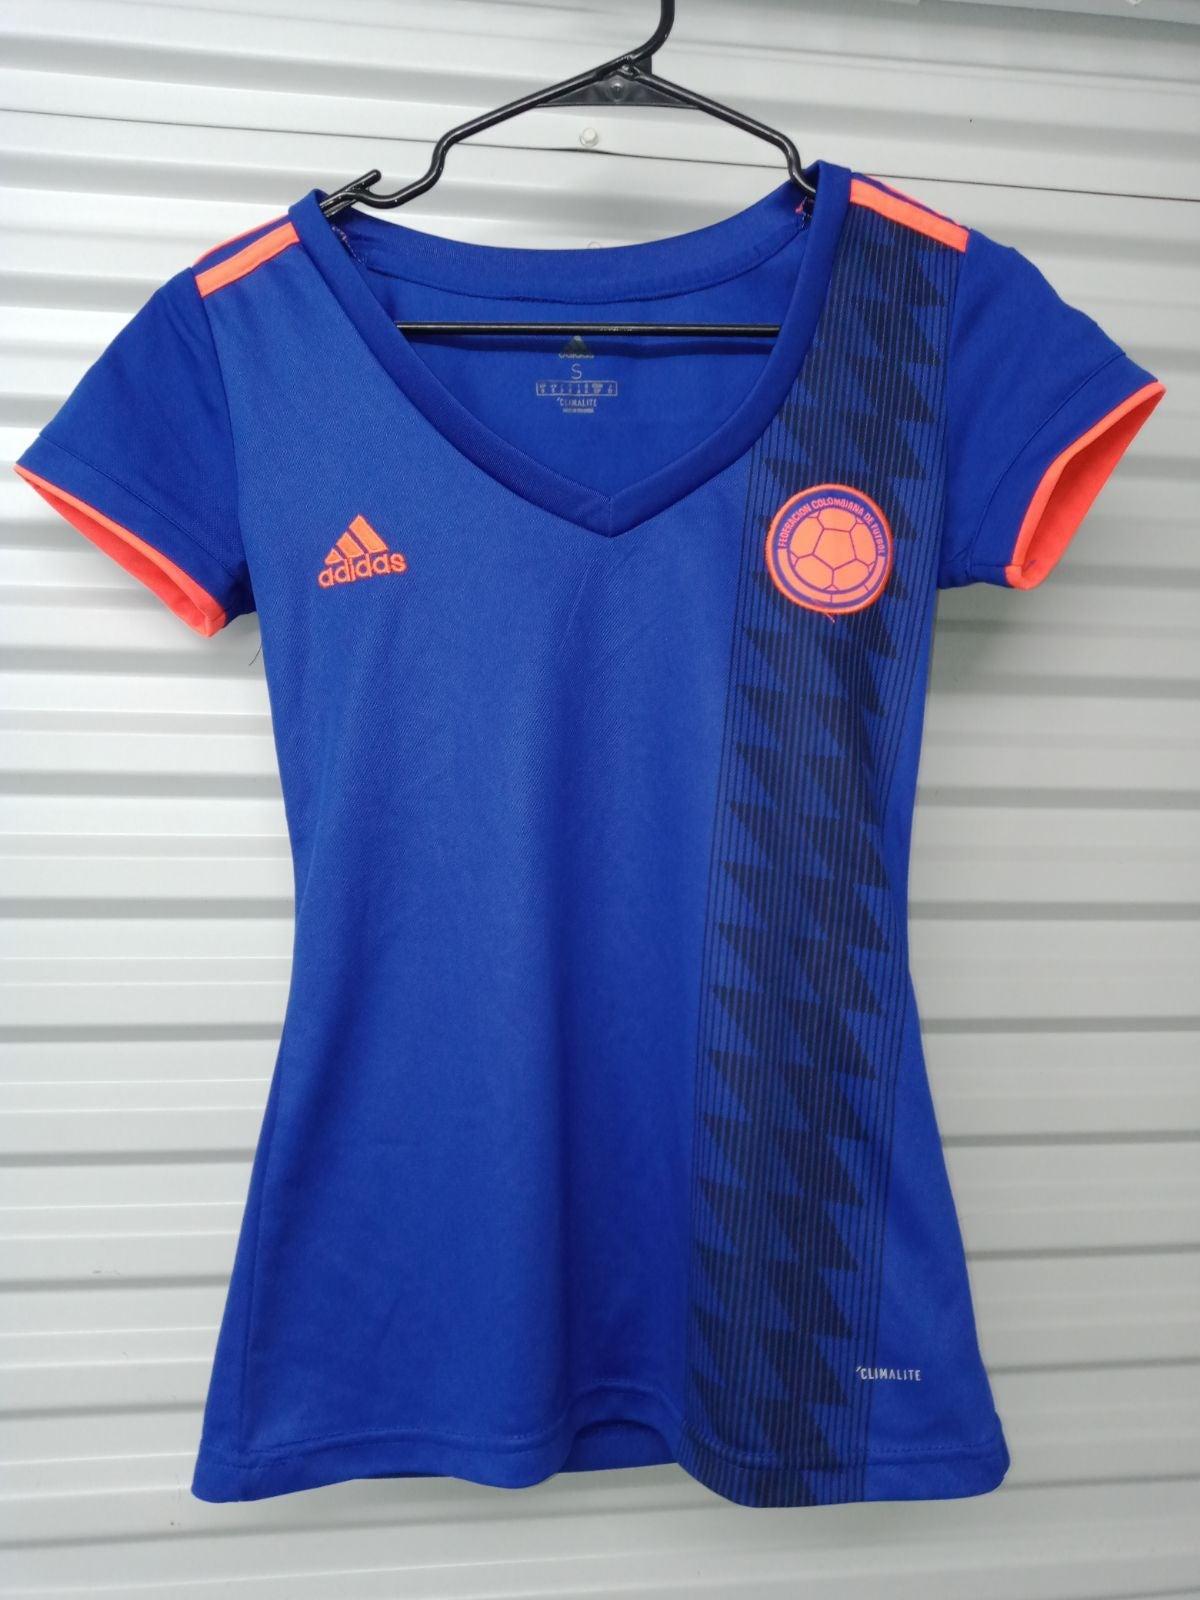 Adidas Sz Small Blue/Orange FCDF Jersey